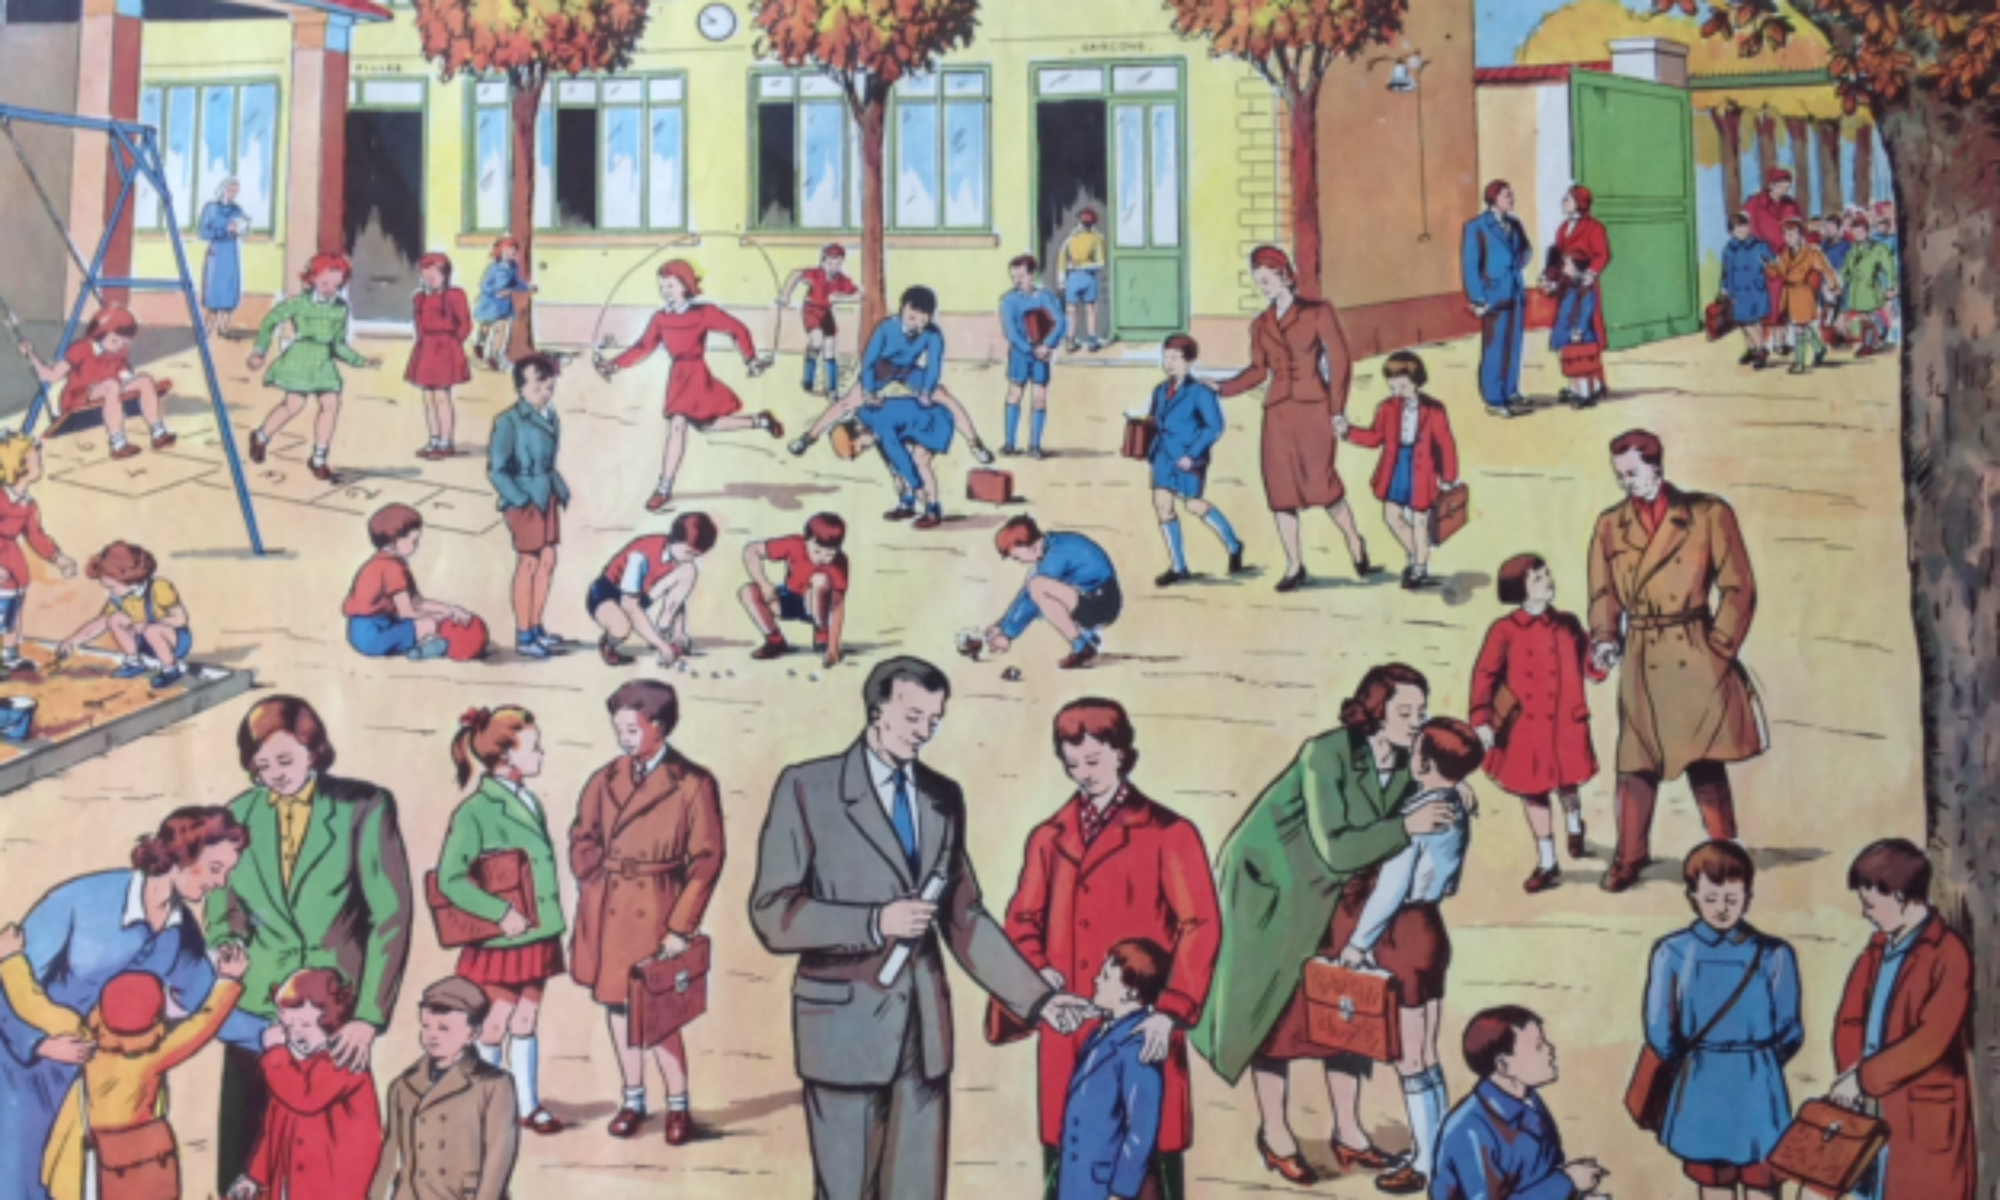 affiches scolaires anciennes rossignol  vintage cartes murales lablache